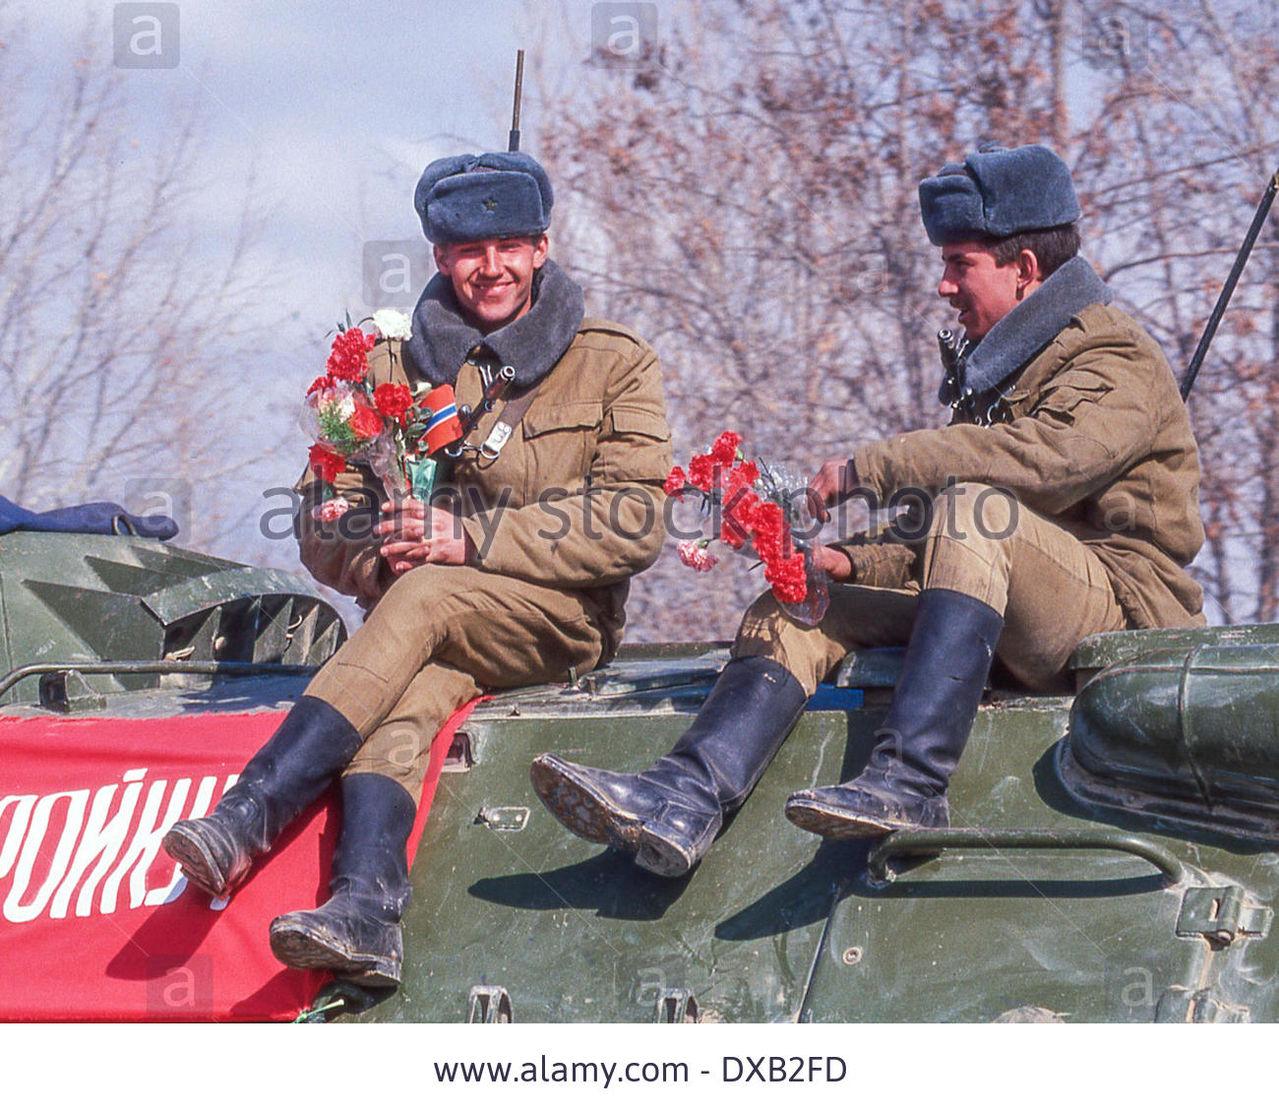 Soviet Afghanistan war - Page 5 Feb_17_1989_termez_uzbekistan_ru_holding_flowers